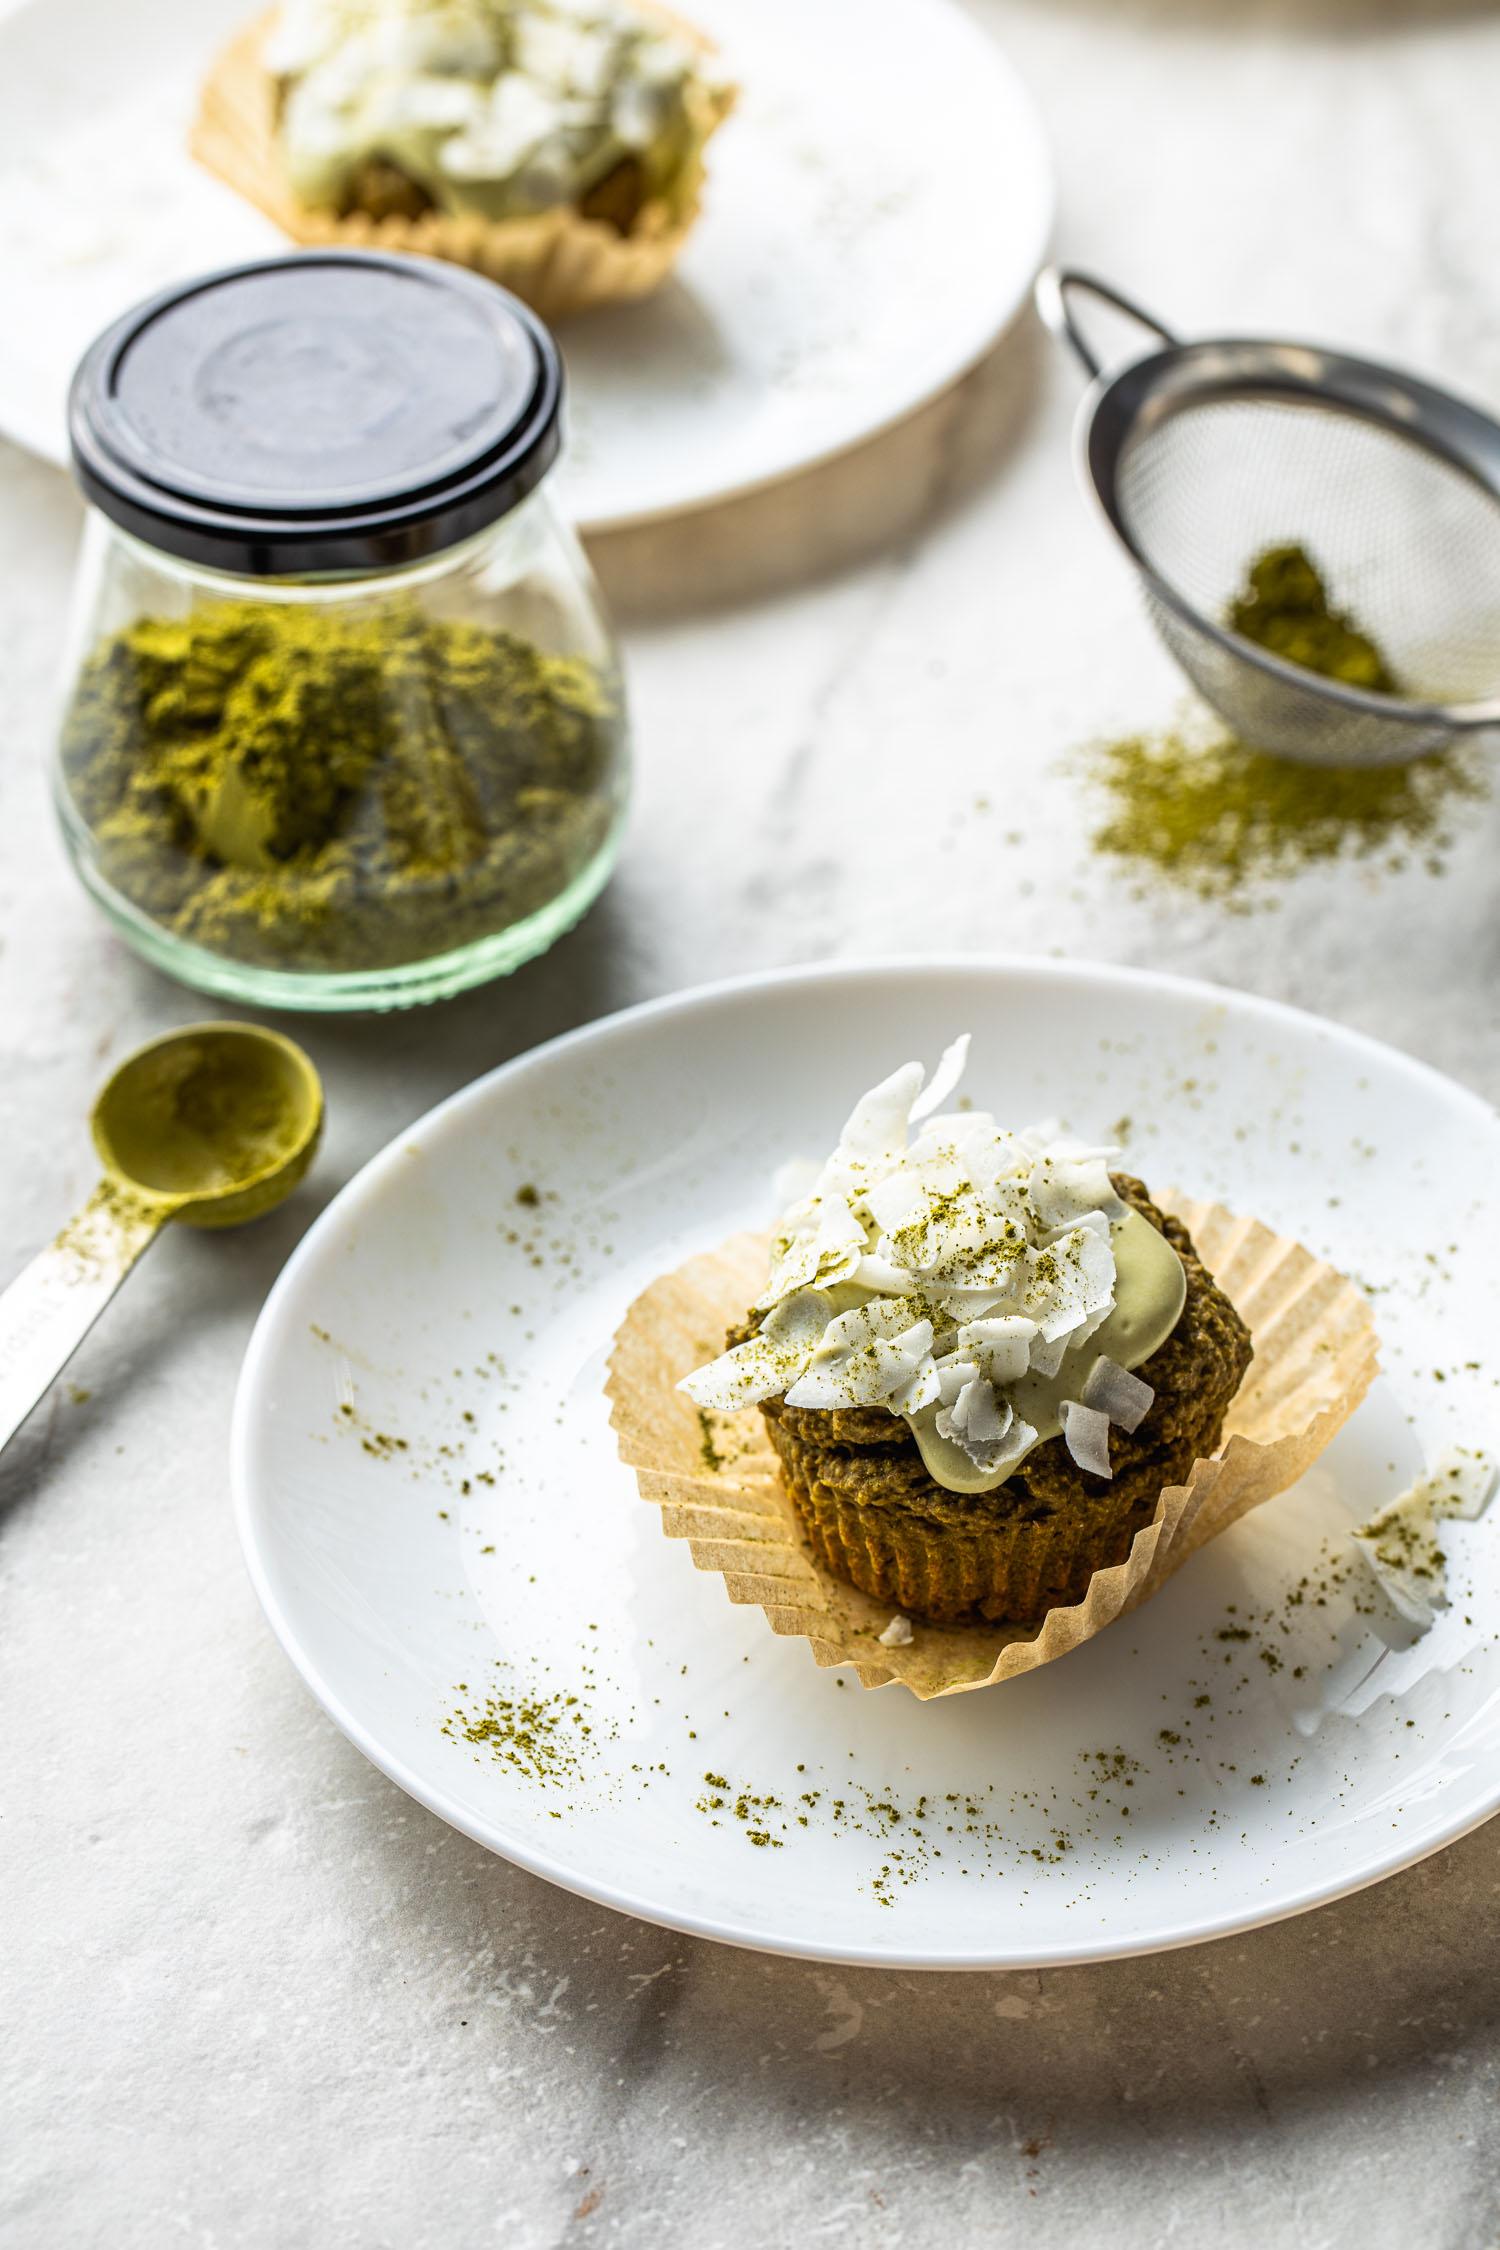 healthy dessert with matcha green tea powder